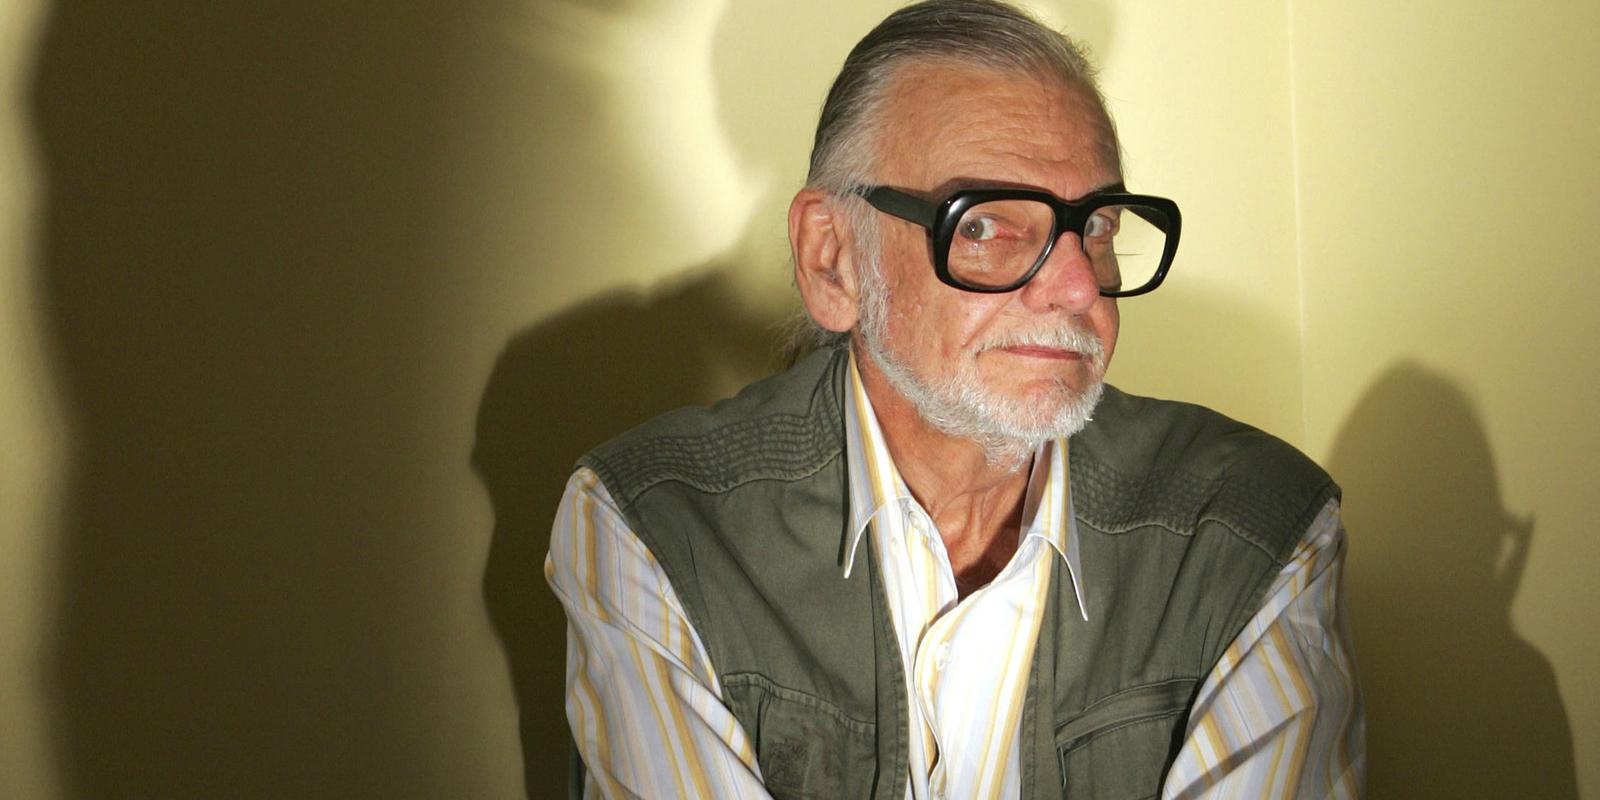 George Romero Night of the Living Dead